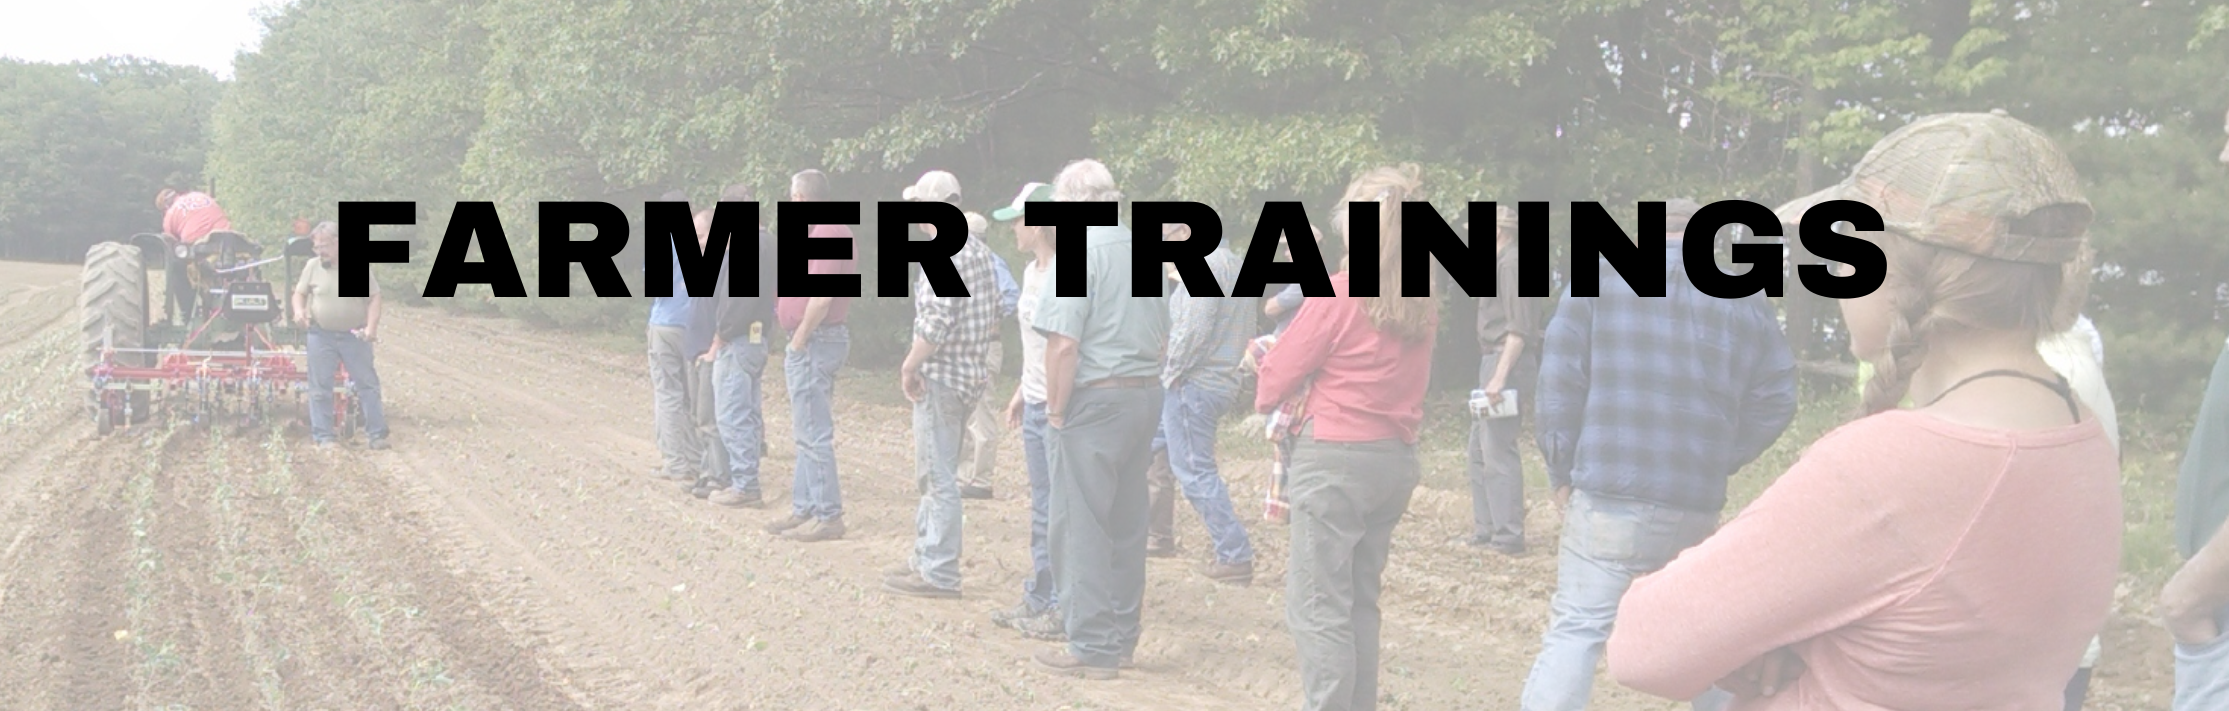 Farmer Trainings